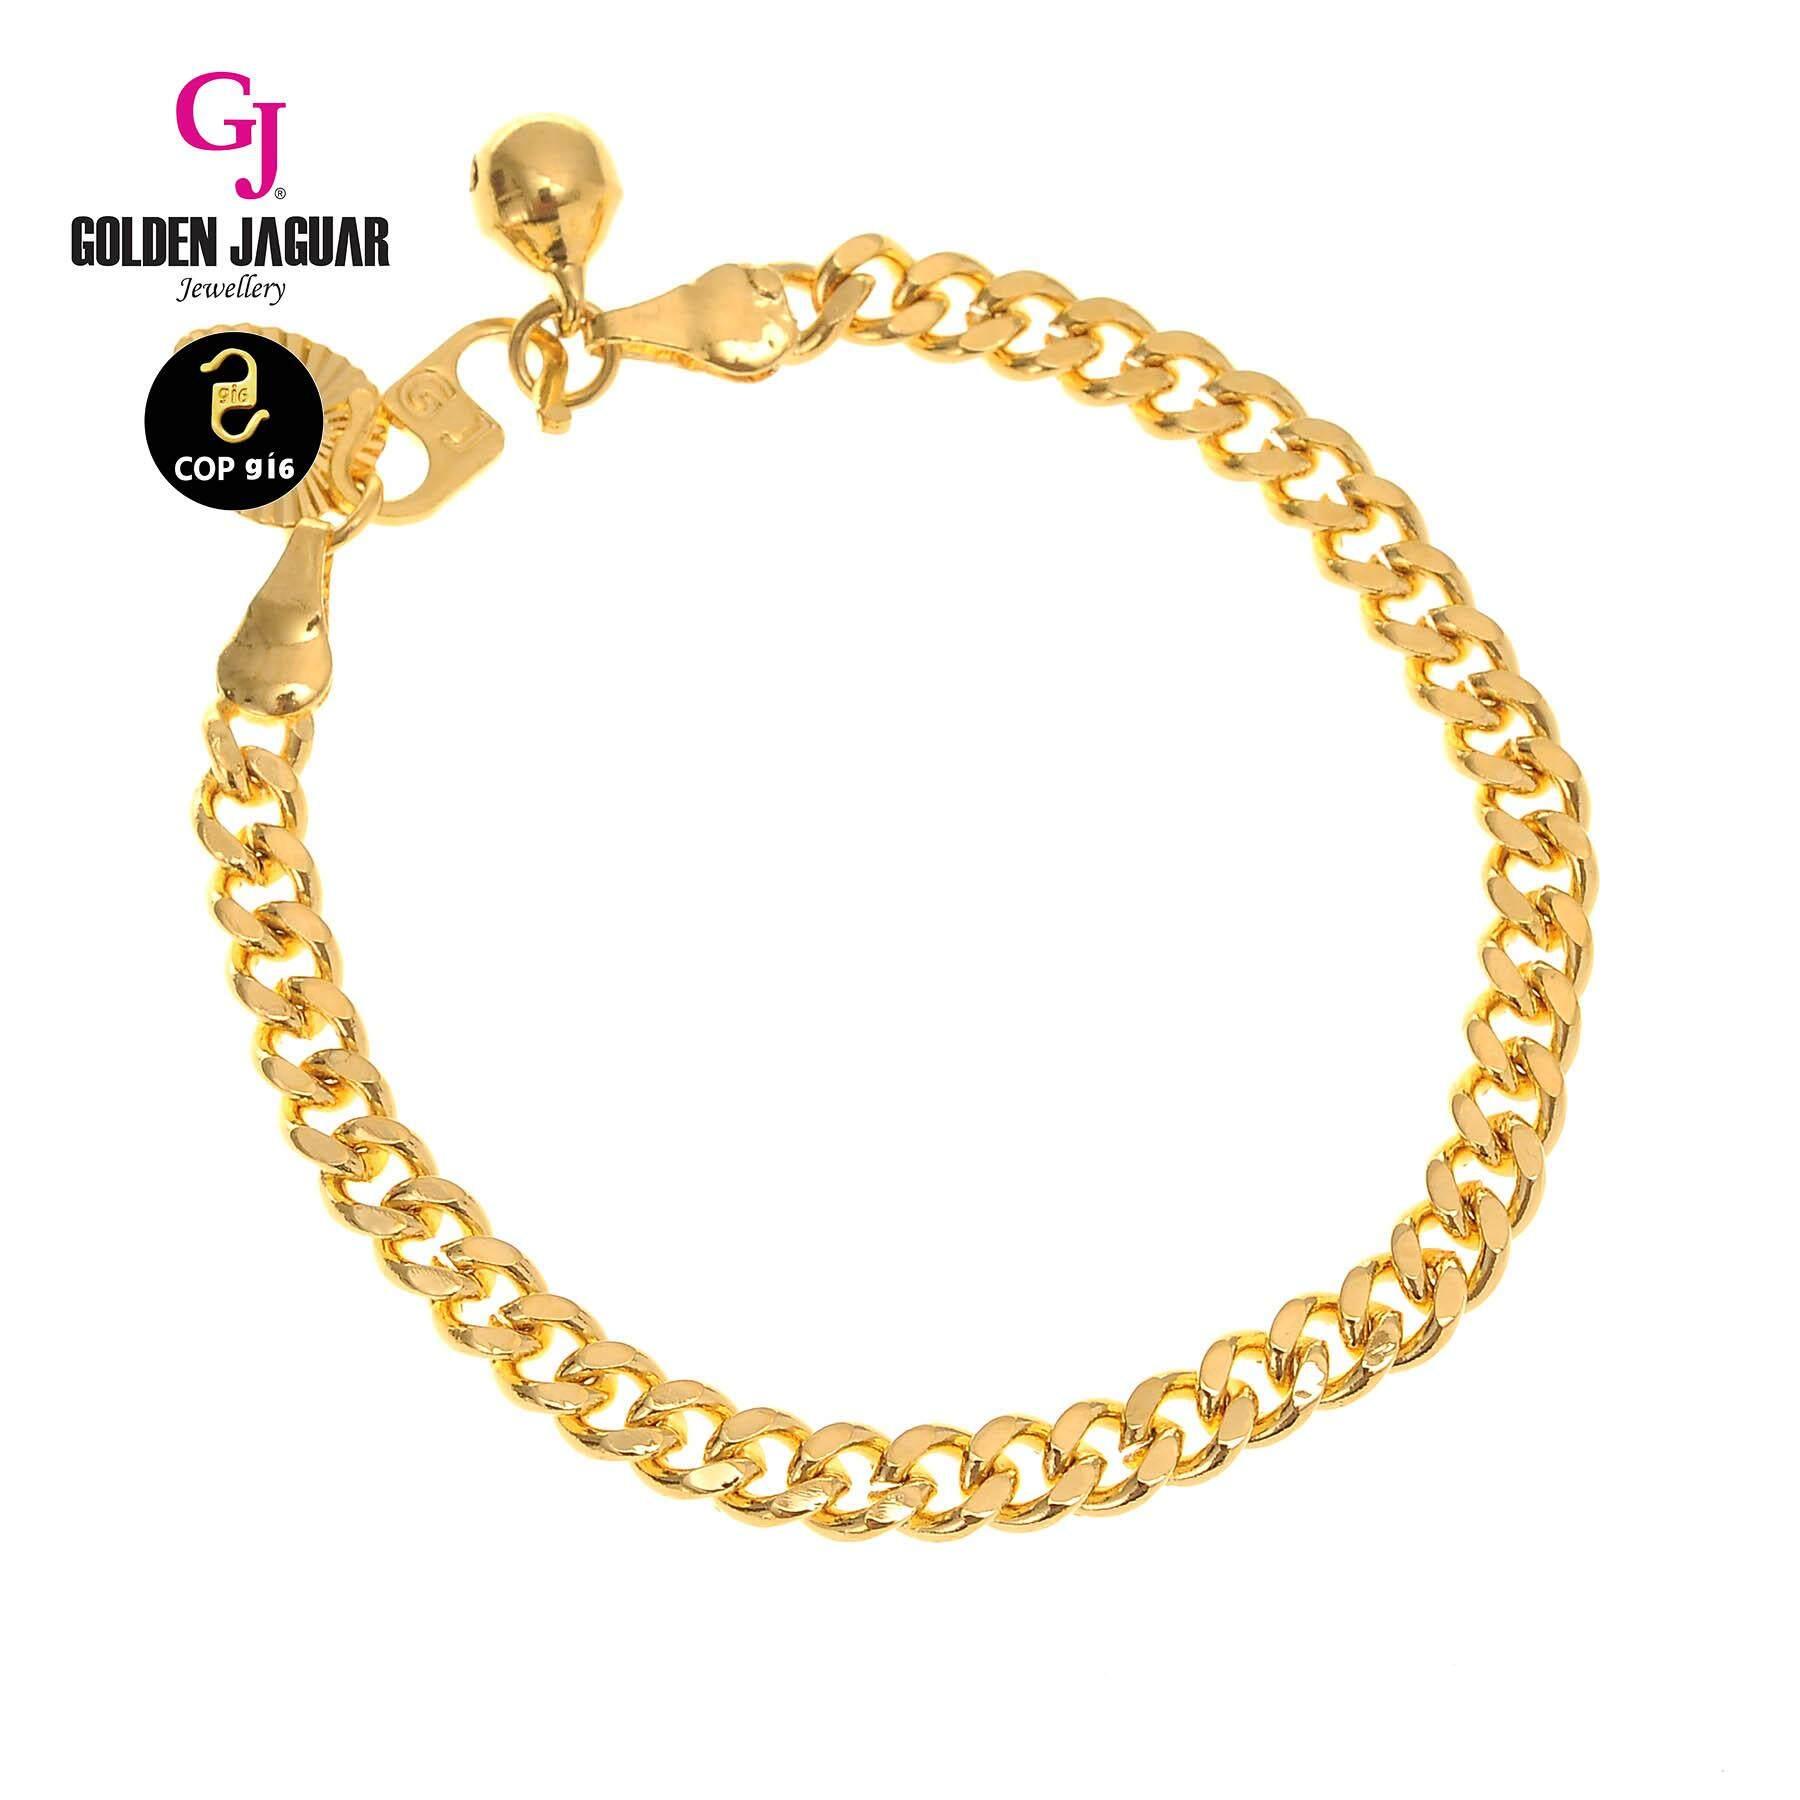 GJ Jewellery Emas Korea Bracelet - Papan  5.0(2560505)/Gold Plated